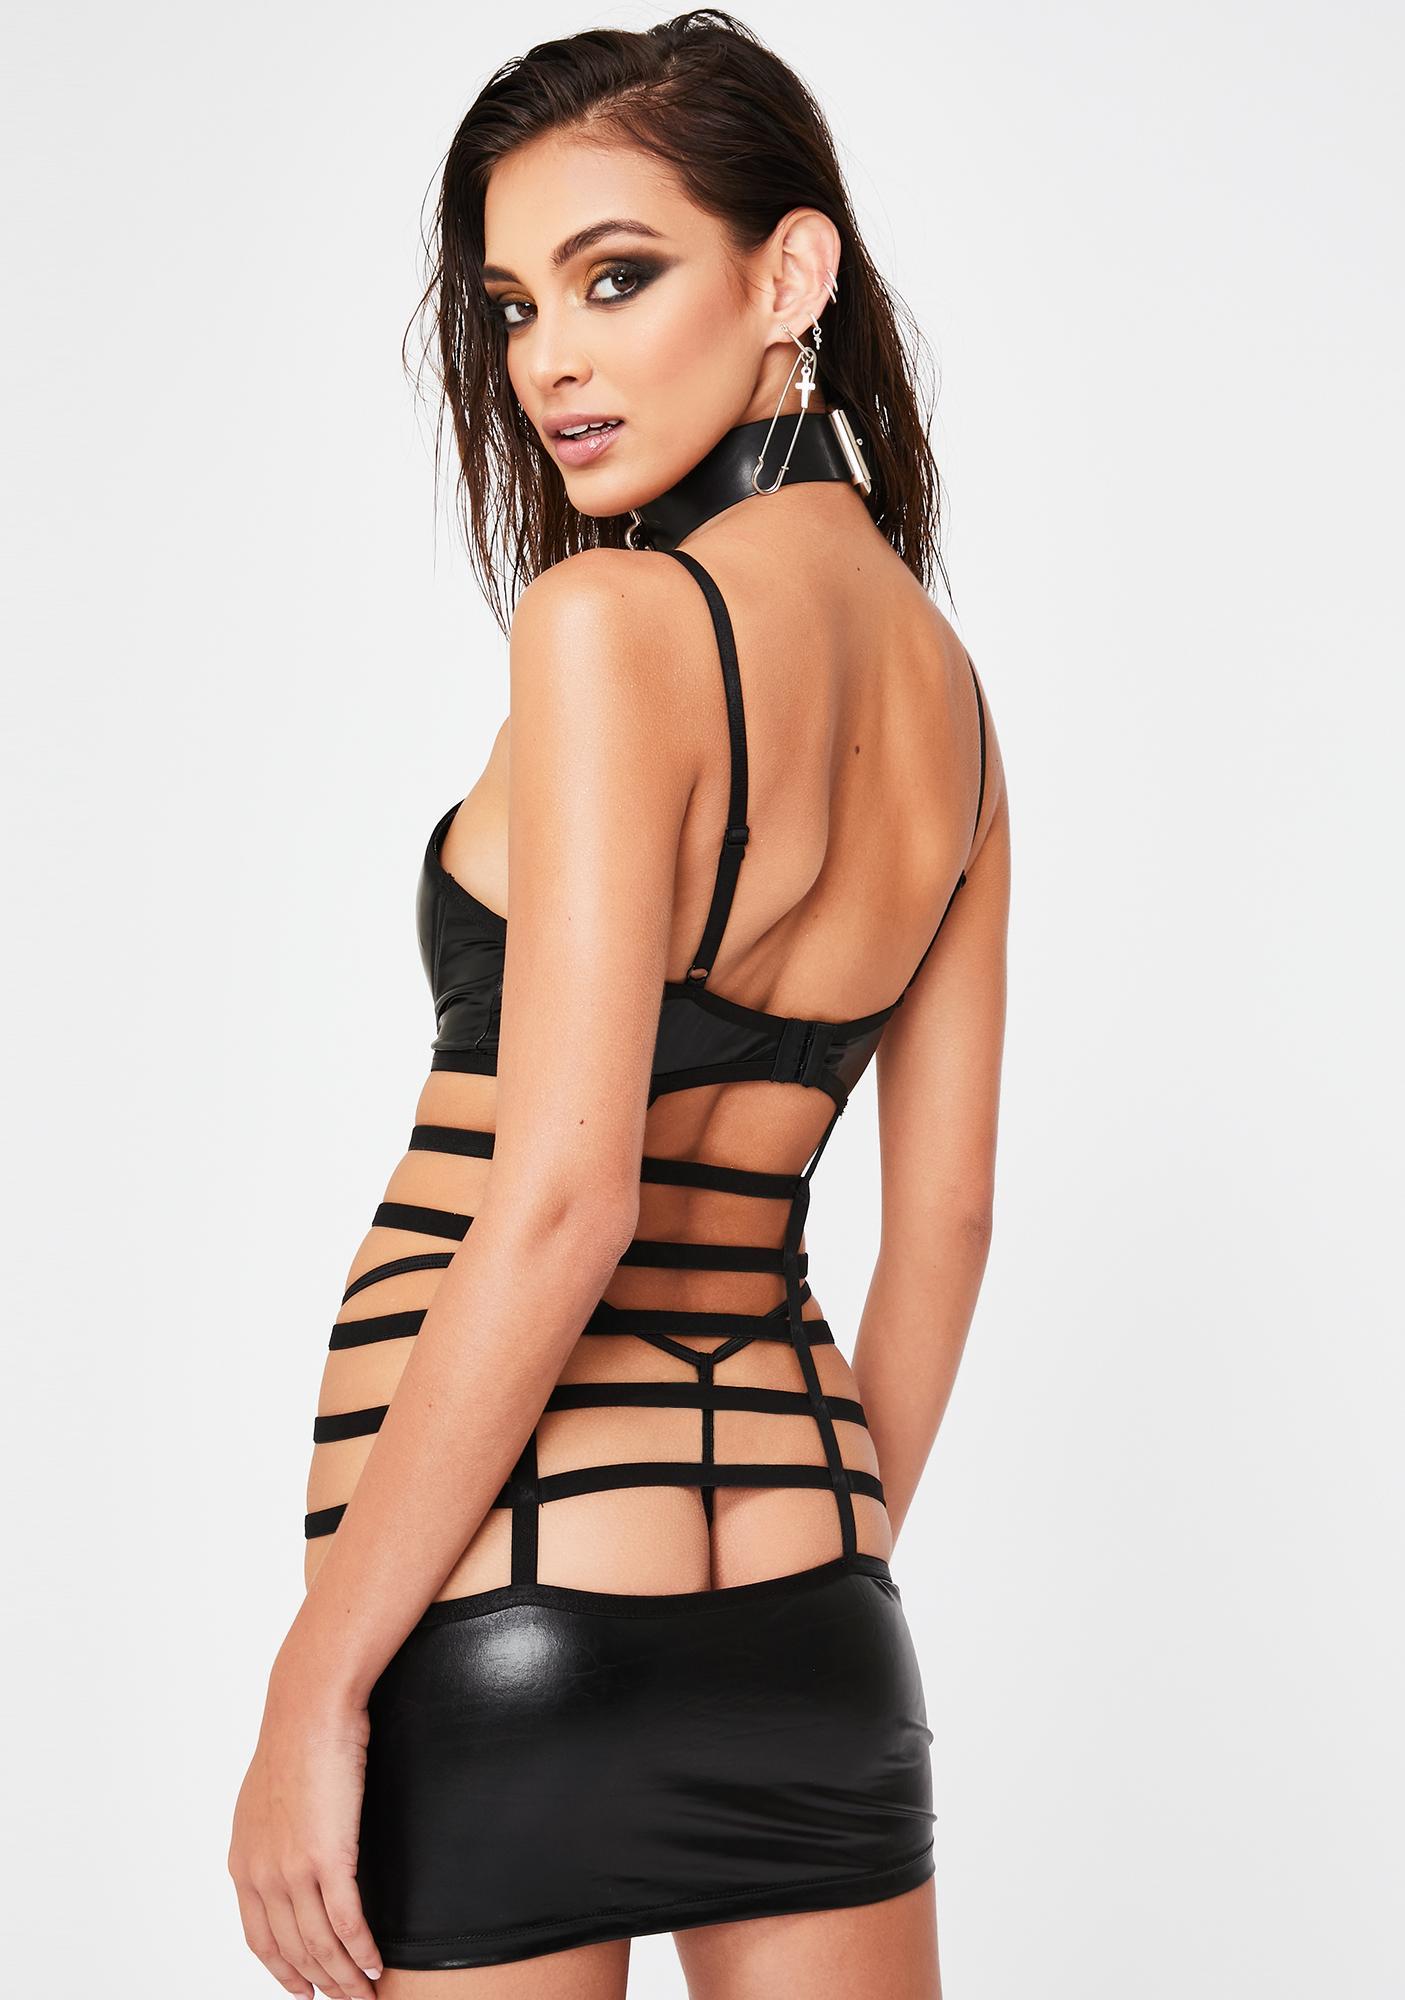 Hands-On Caged Mini Dress N' G-String Set